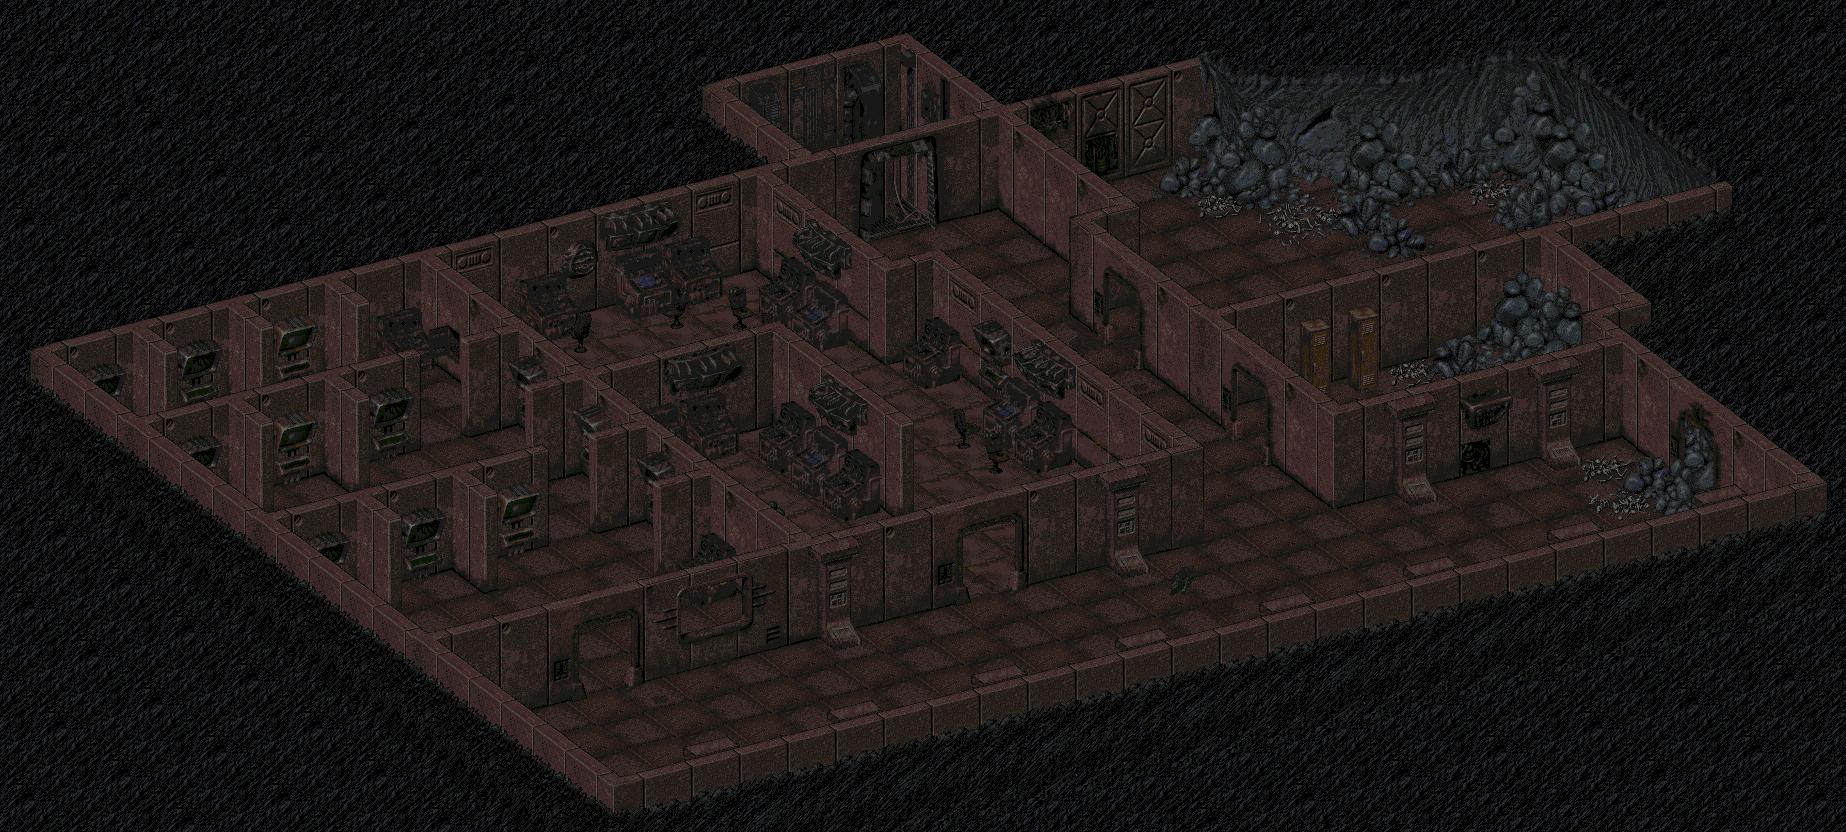 Fo1 Vault 15 Command Center.png